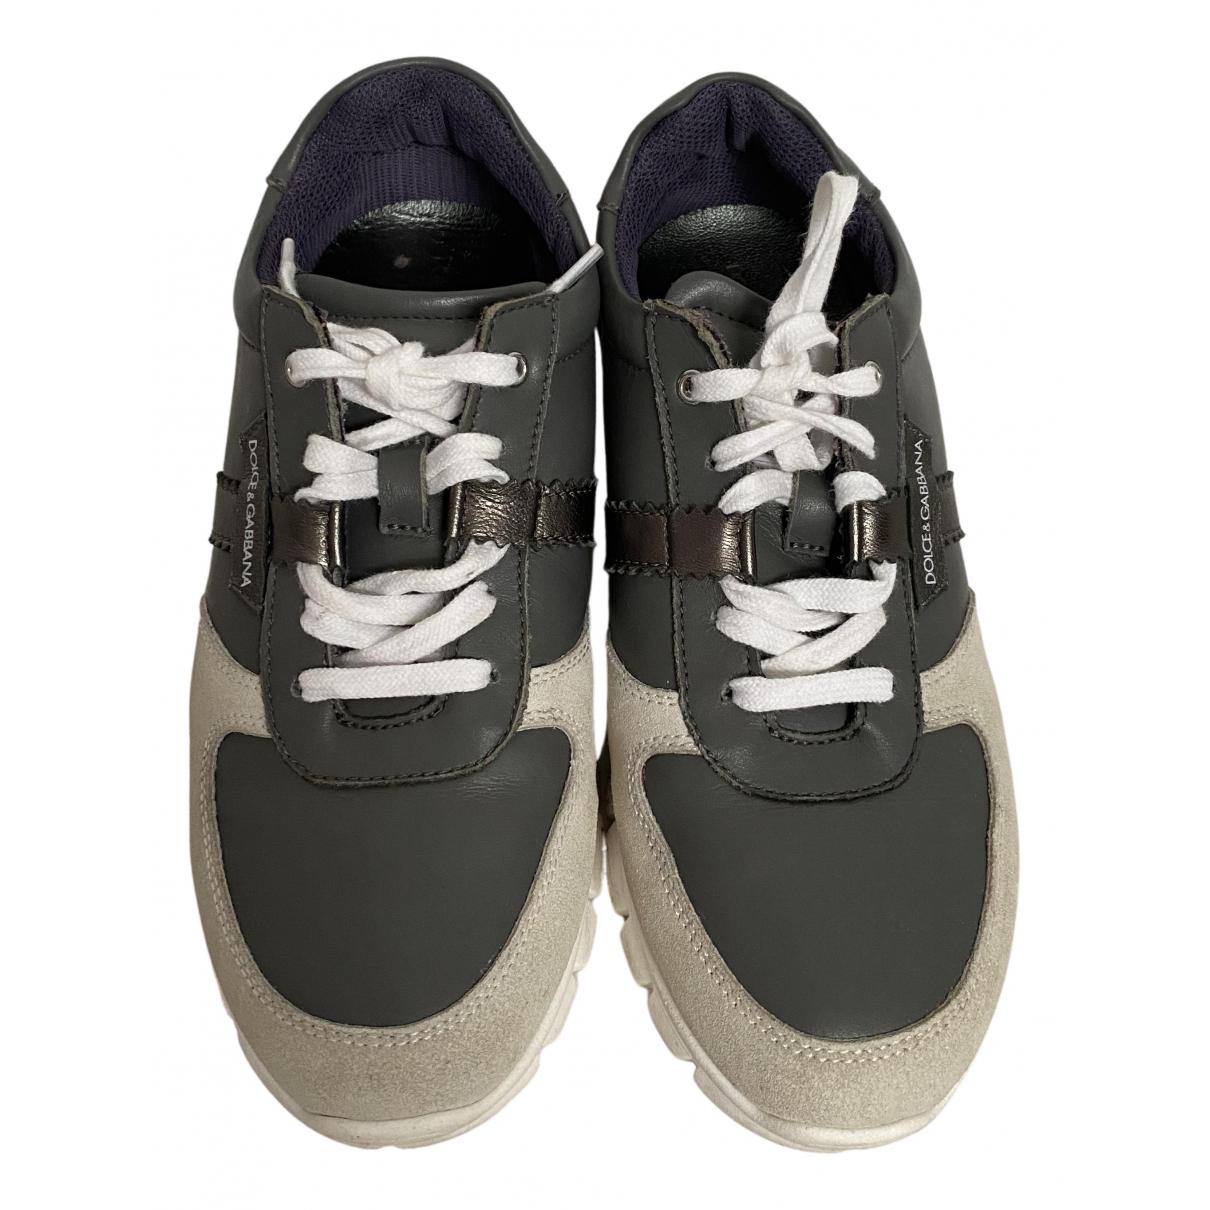 Dolce & Gabbana N Grey Leather Trainers for Women 35 EU